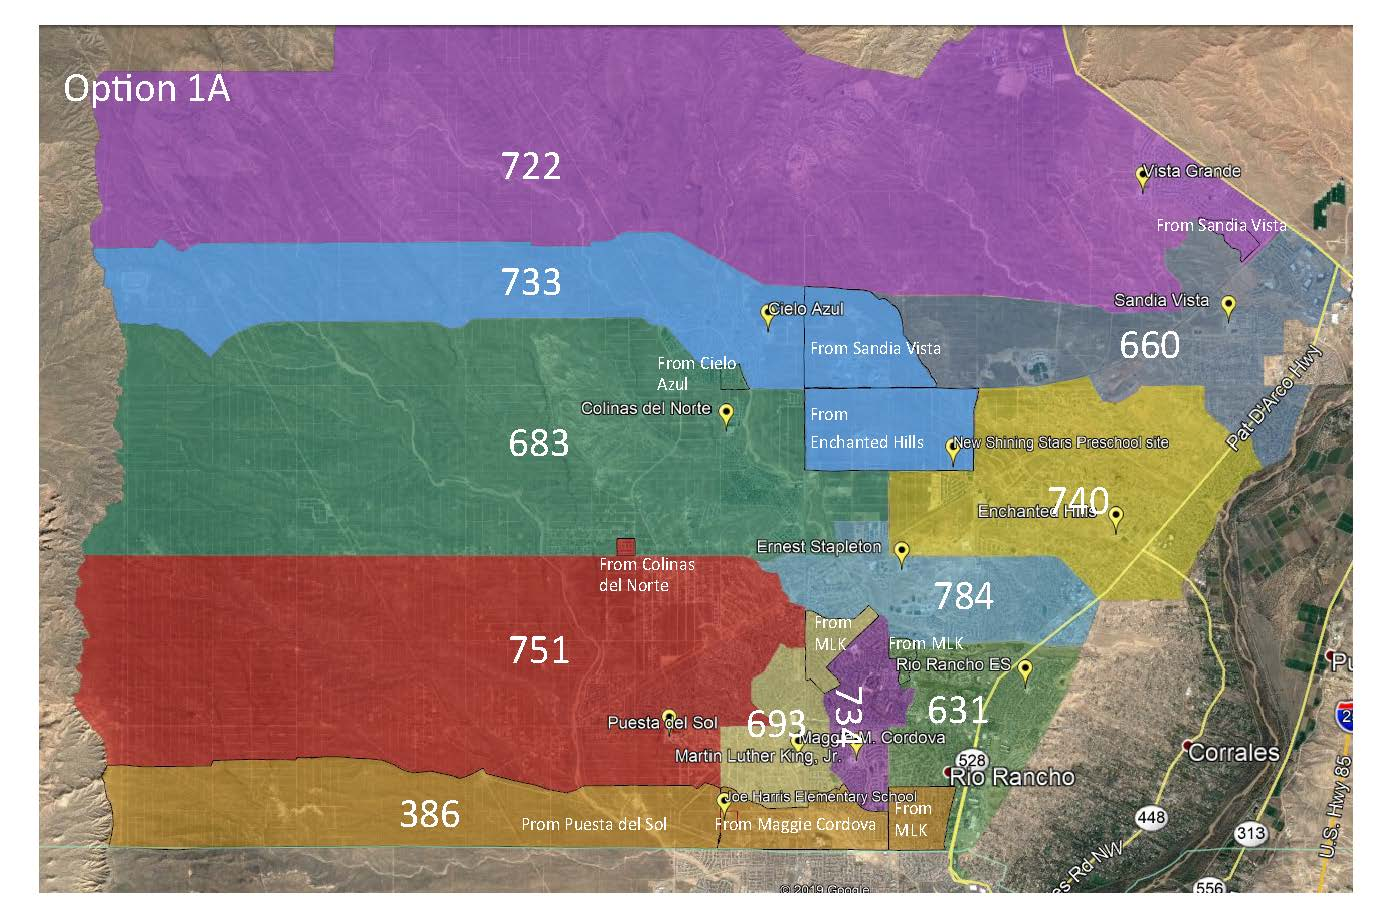 2020 boundary option 1a